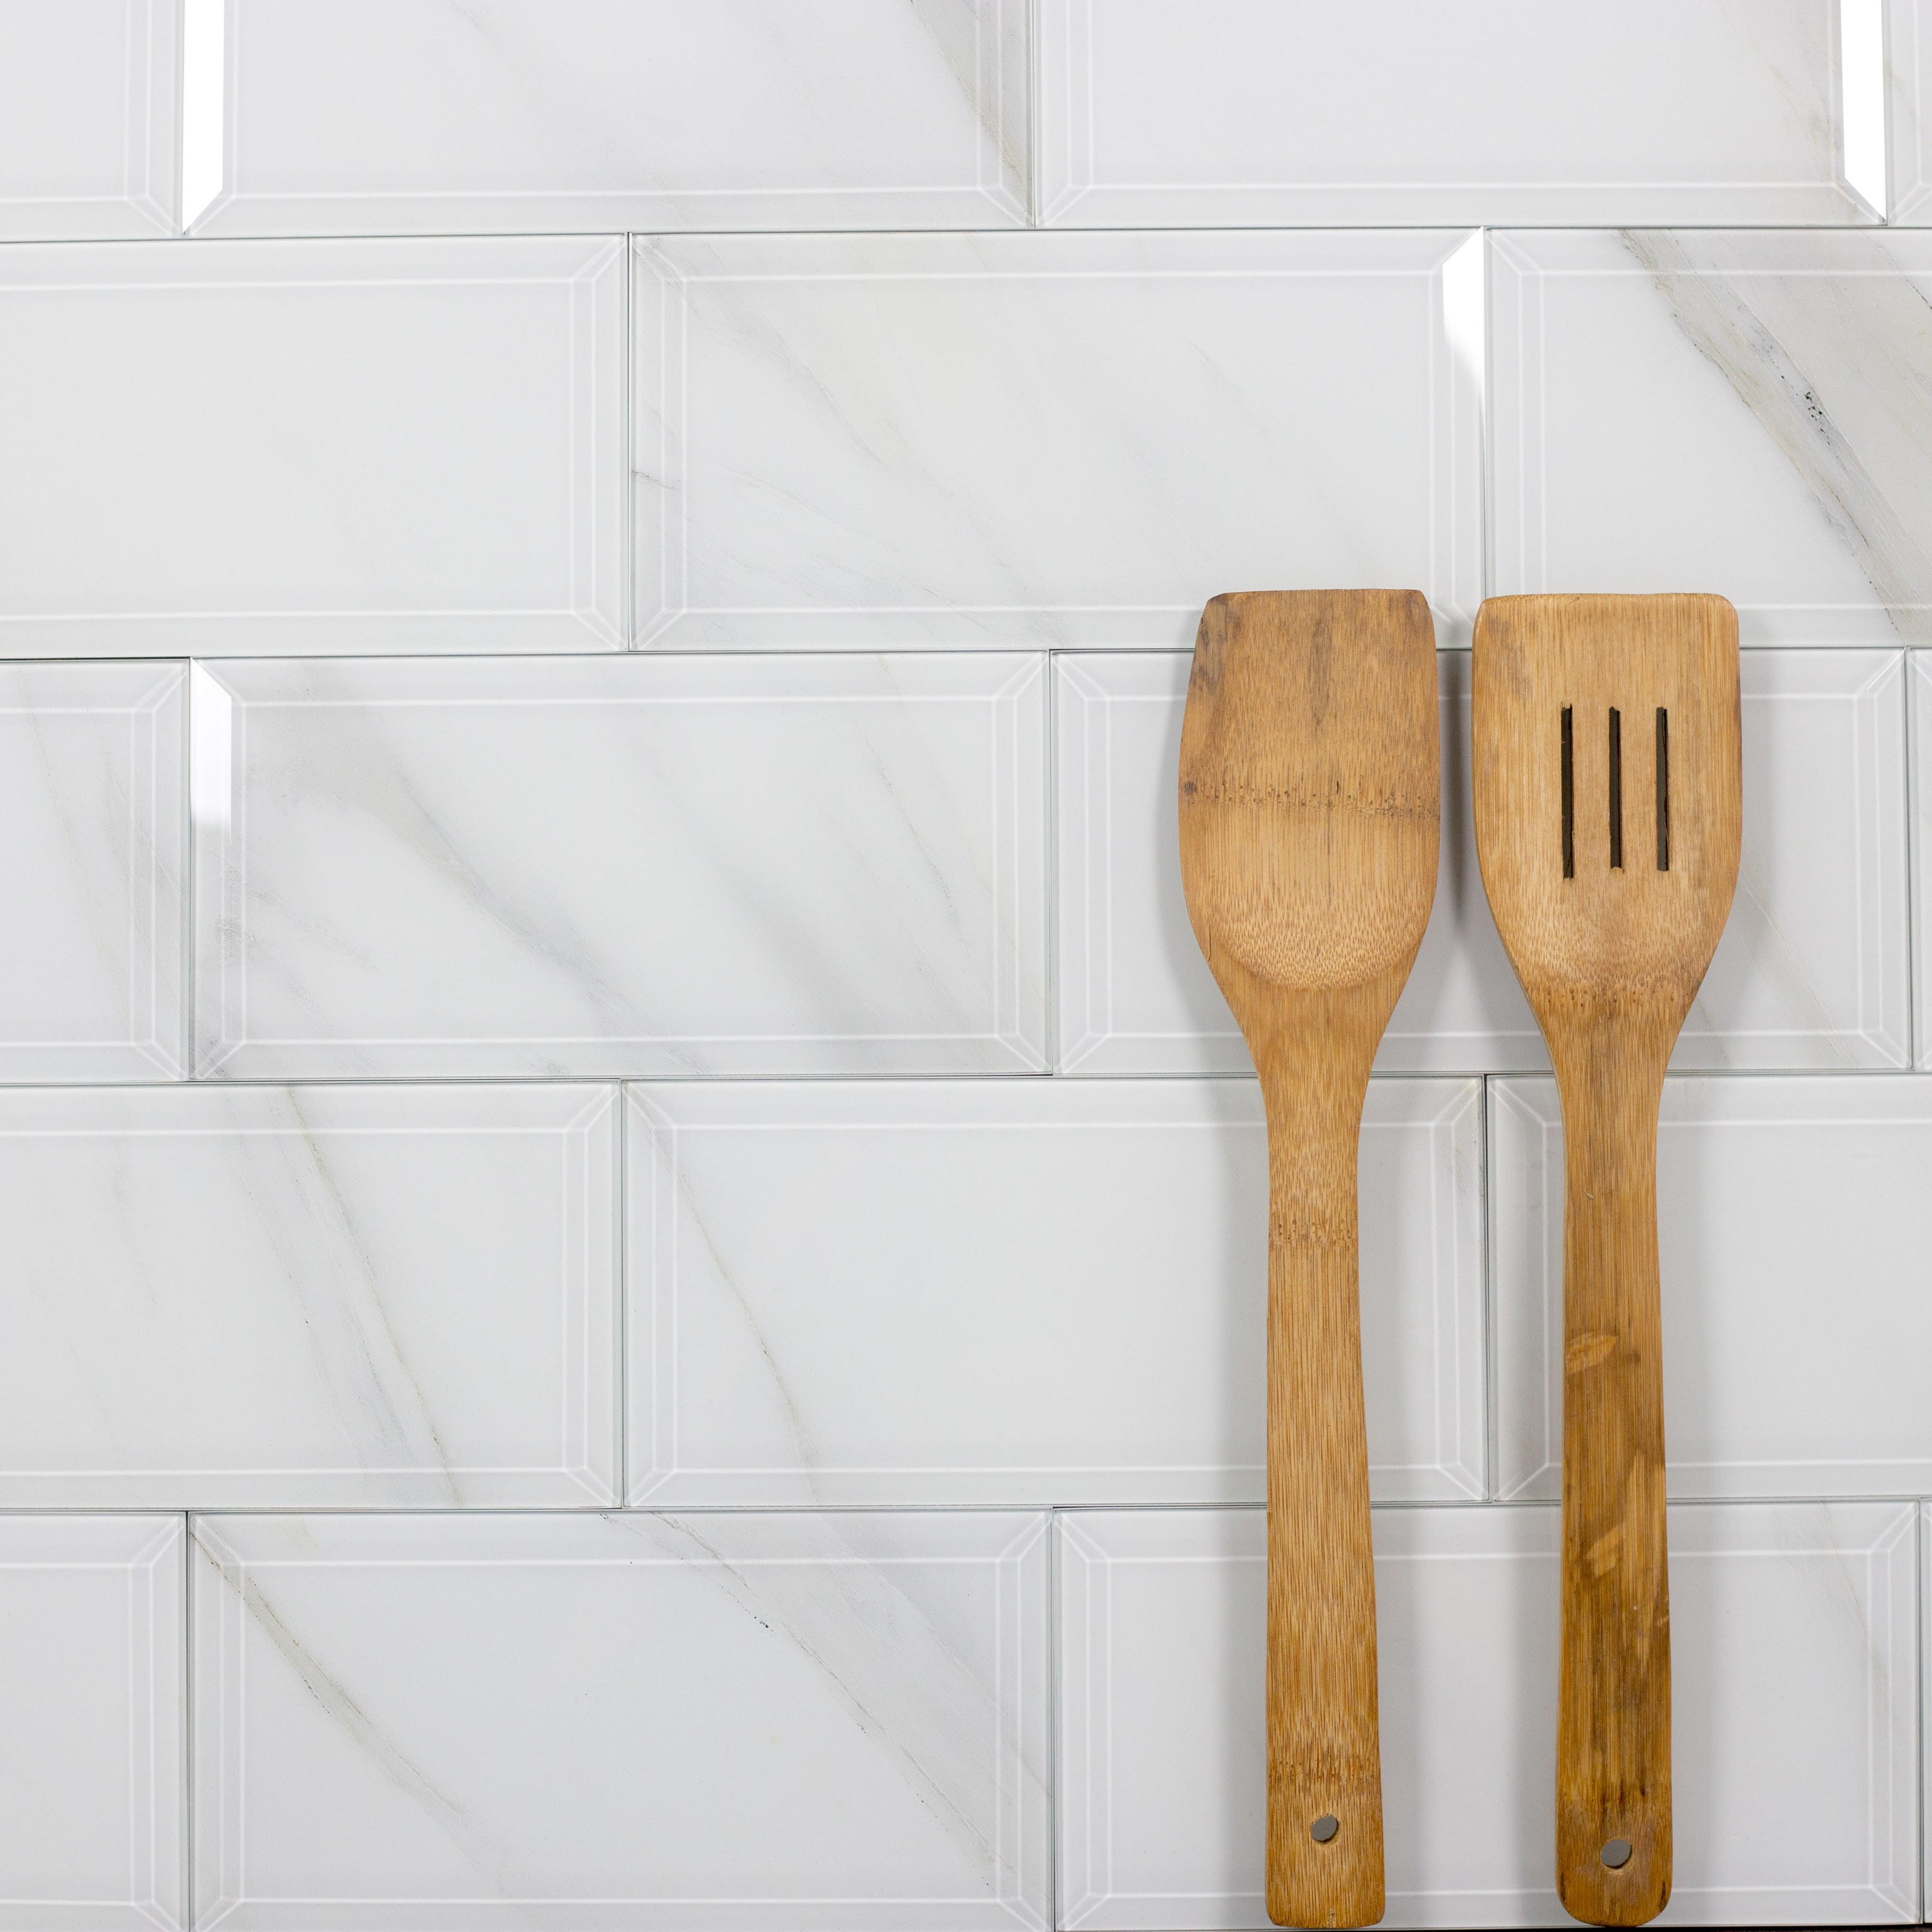 "Abolos- Nature Wall Backsplash Beveled Edge 4"" x 8"" Glass Subway Tile in Calacatta White (16sqft / 72pc Box)"